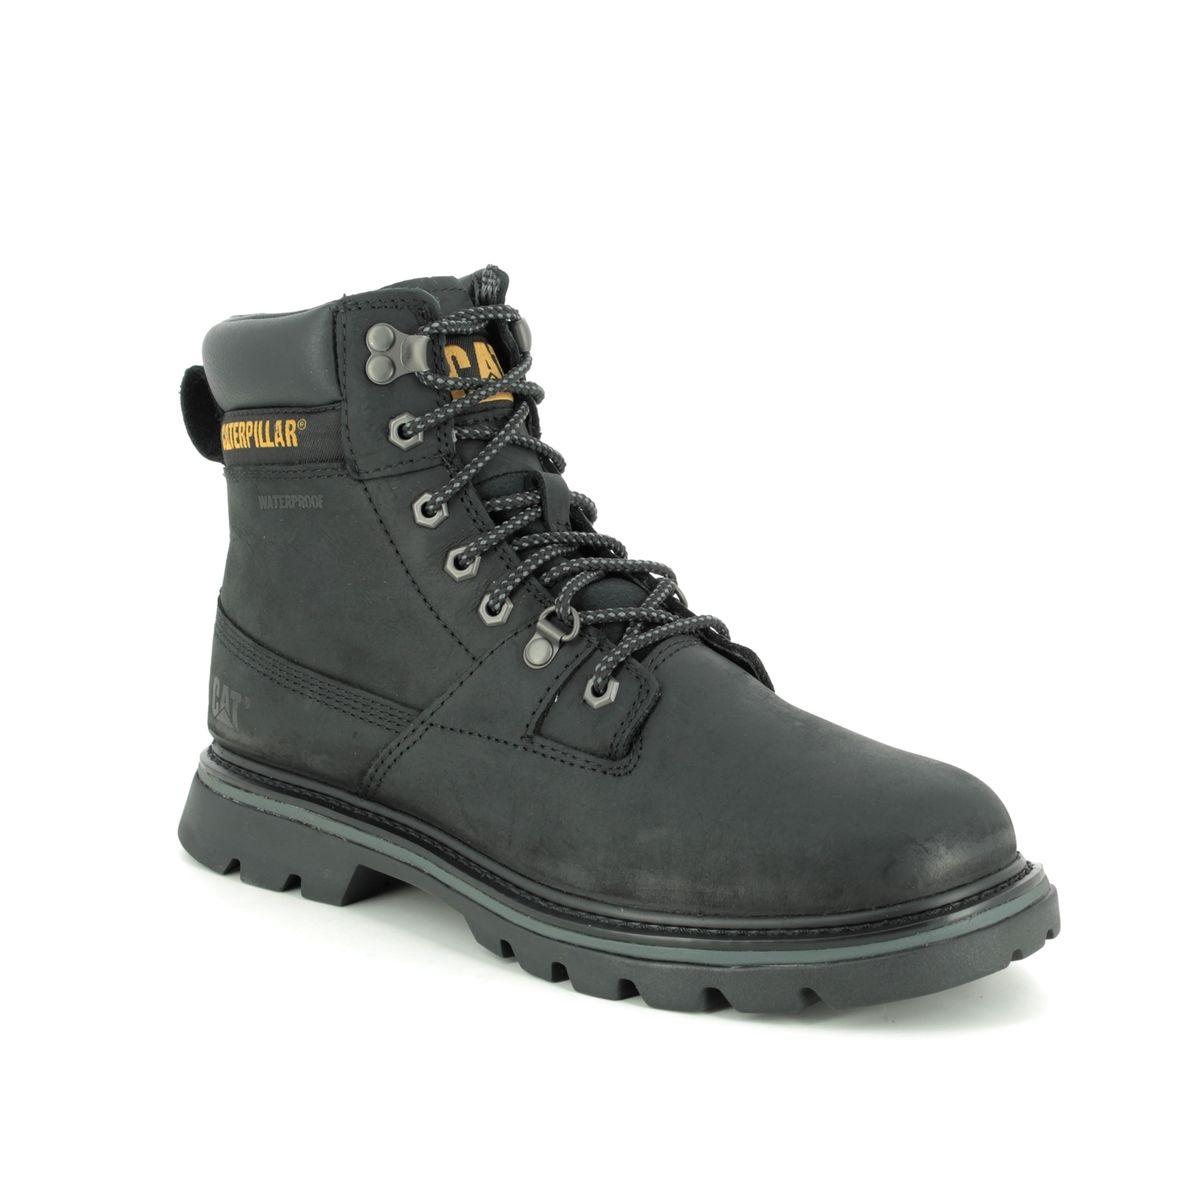 P723801 Ryman Tex At Begg Shoes Bags